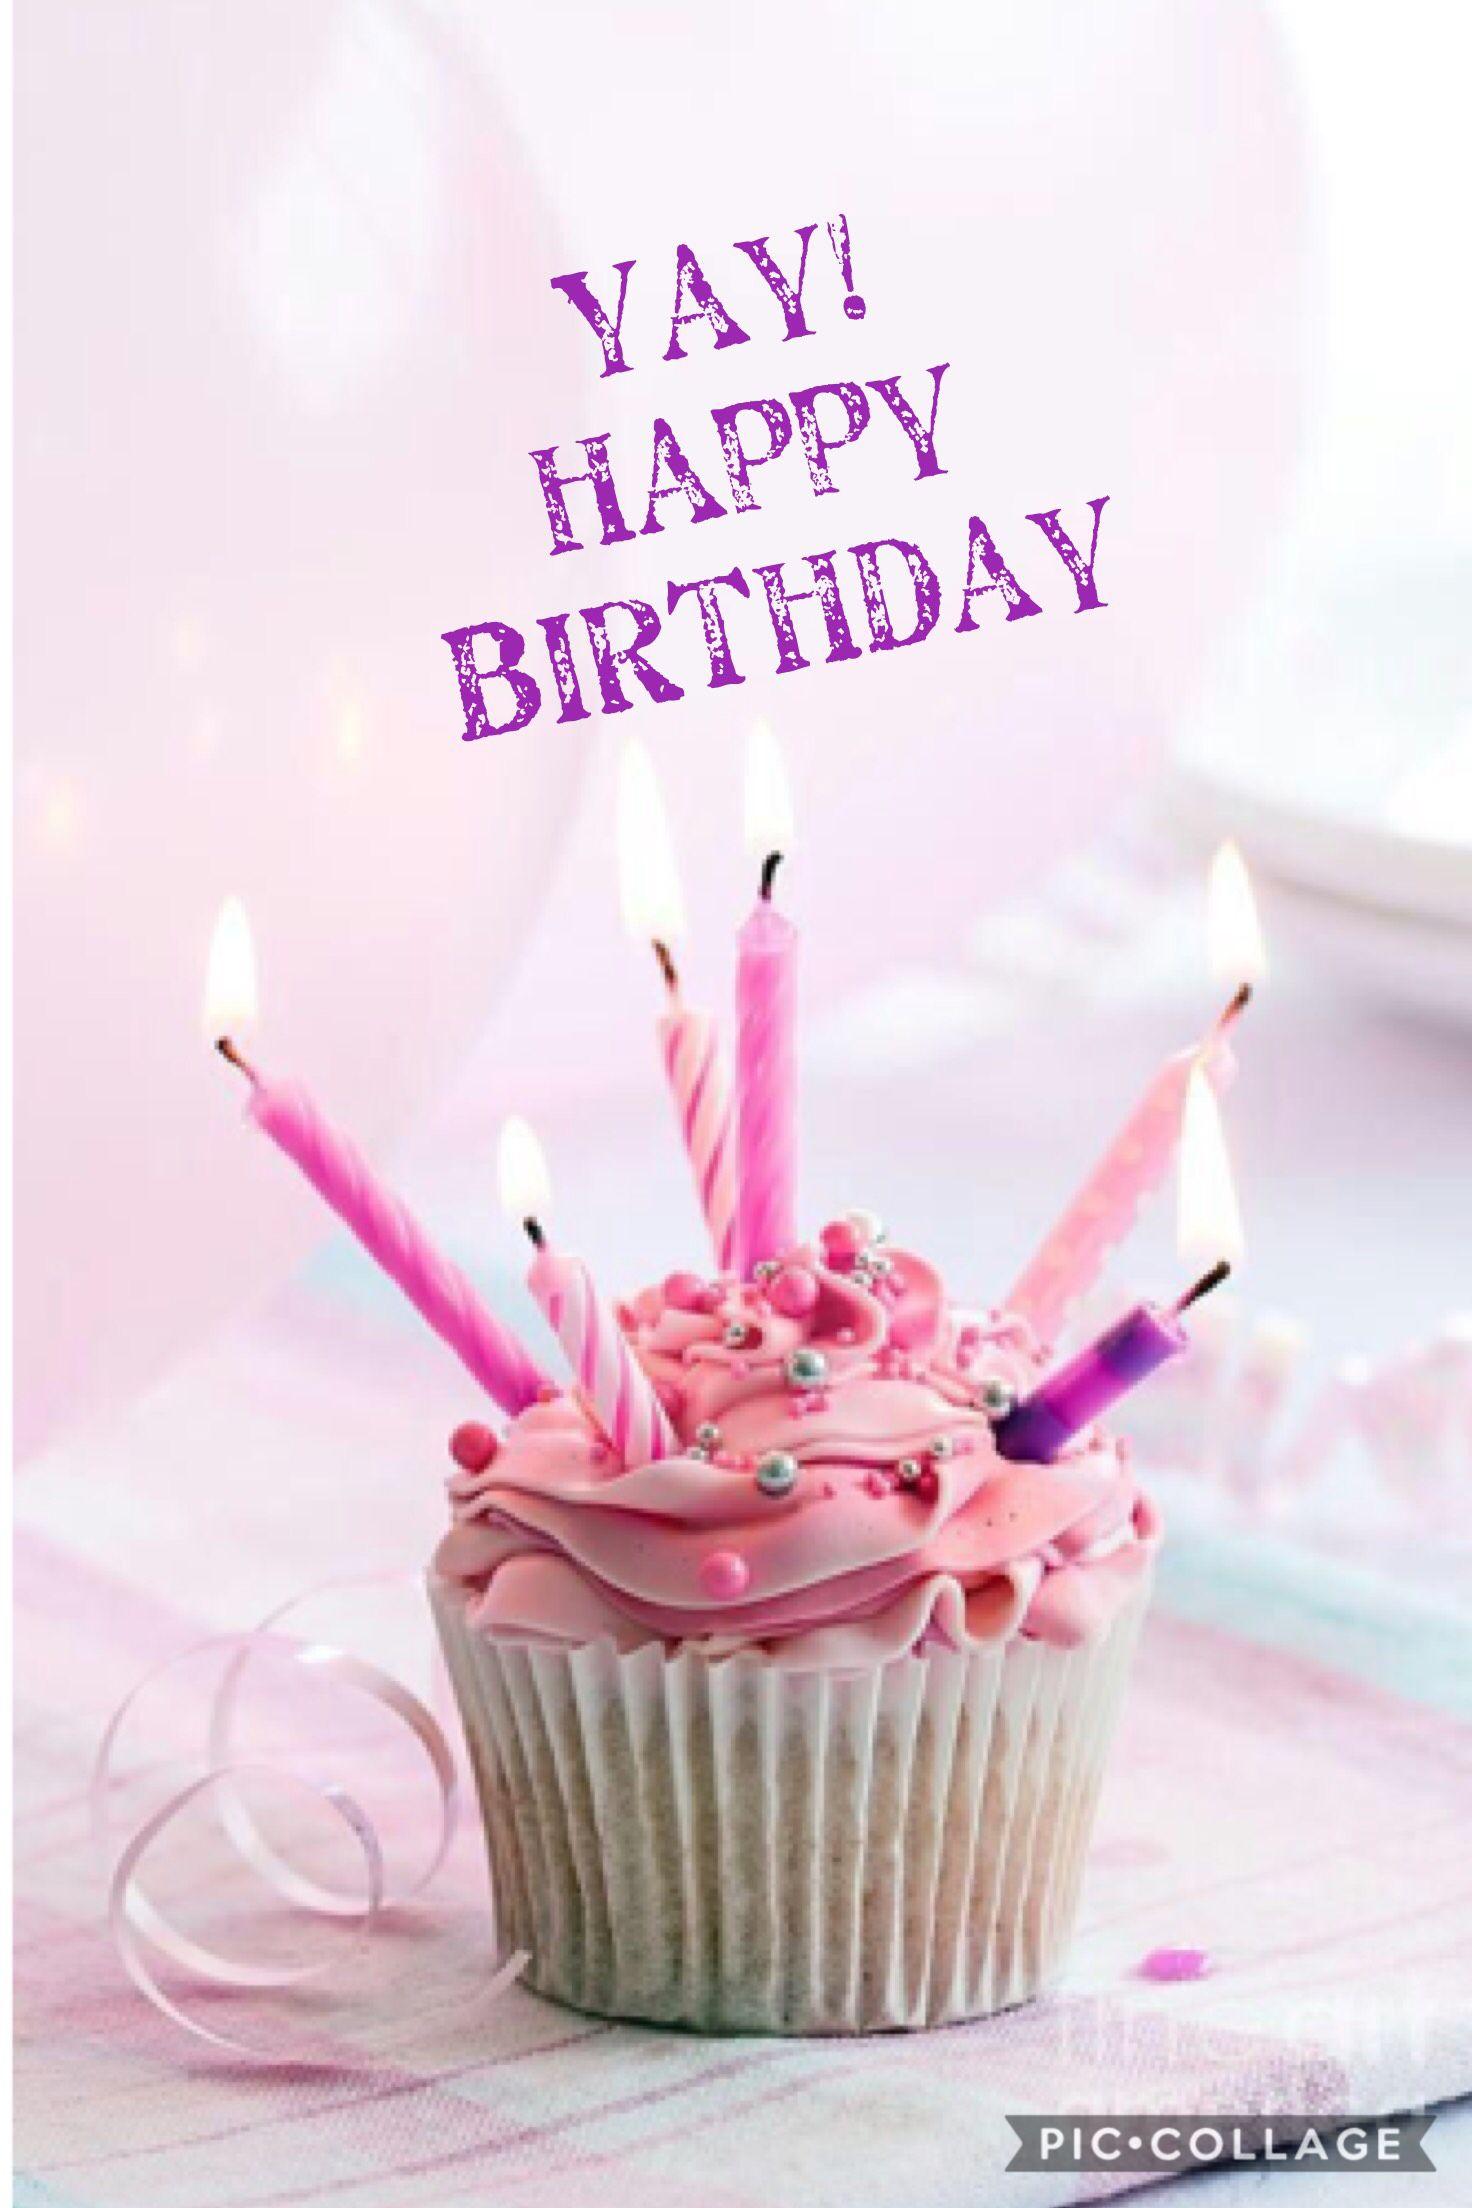 Happy Birthday Ameeta August 12th . Birthday, Happy